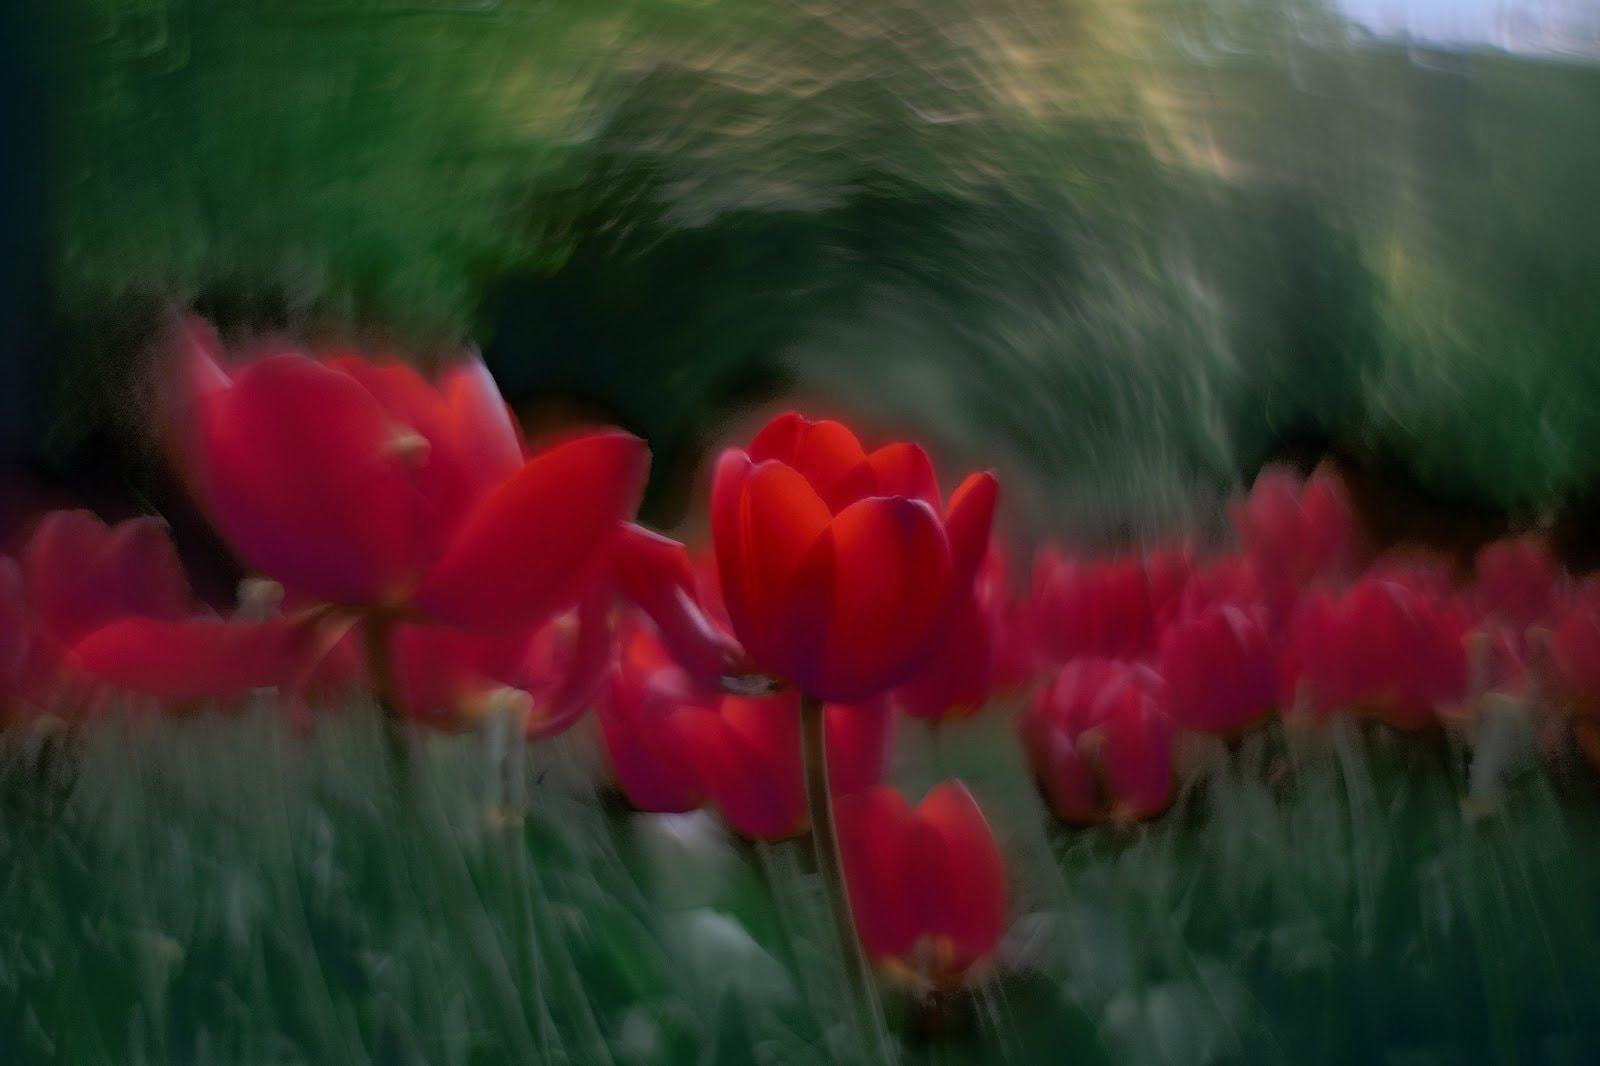 Example of curvilinear bokeh photo of tulips by Artur Malinowski